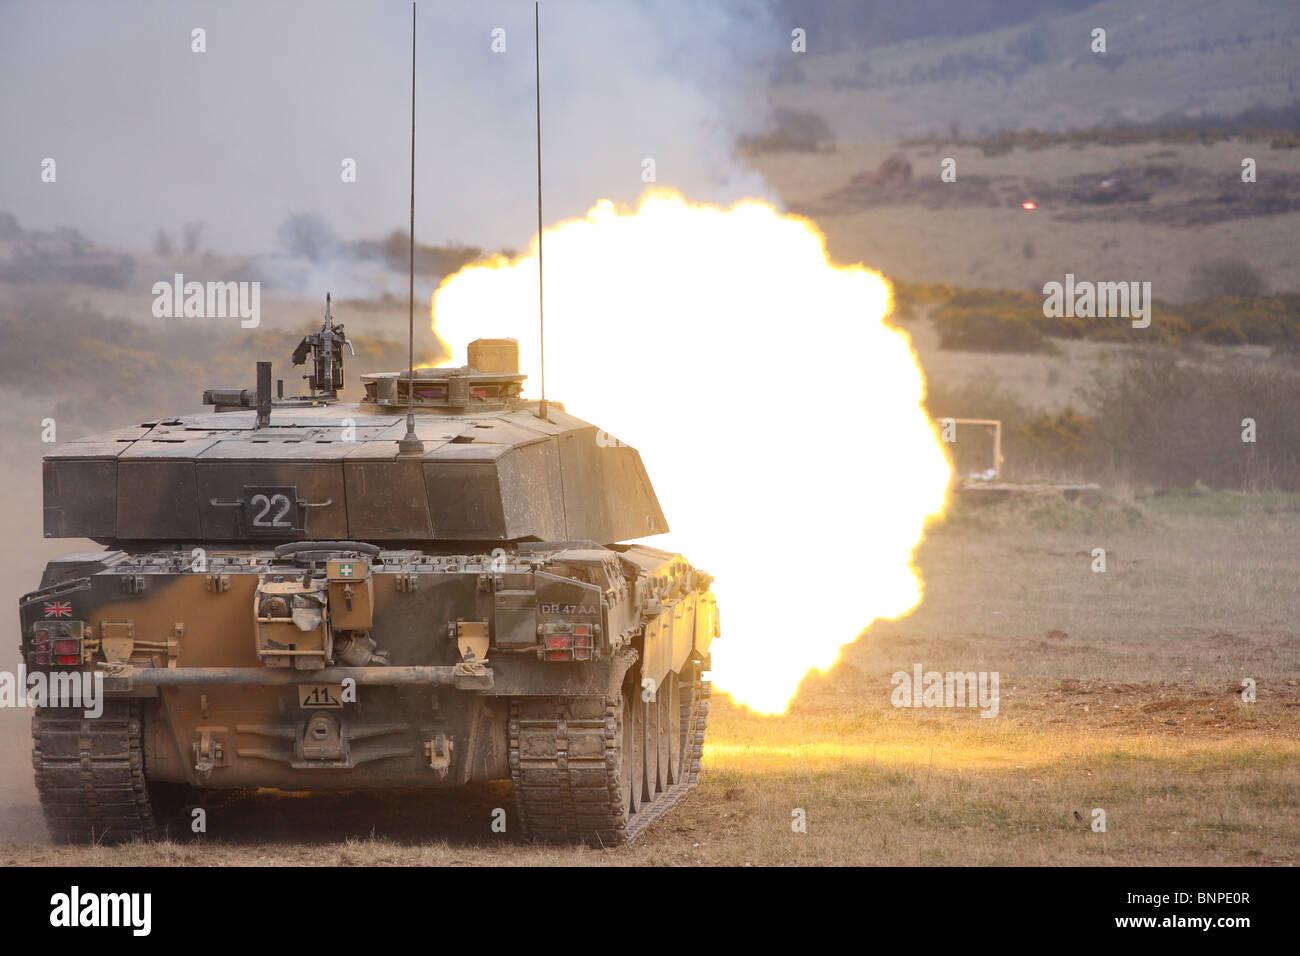 British Army Challenger 2 tank firing - Stock Image